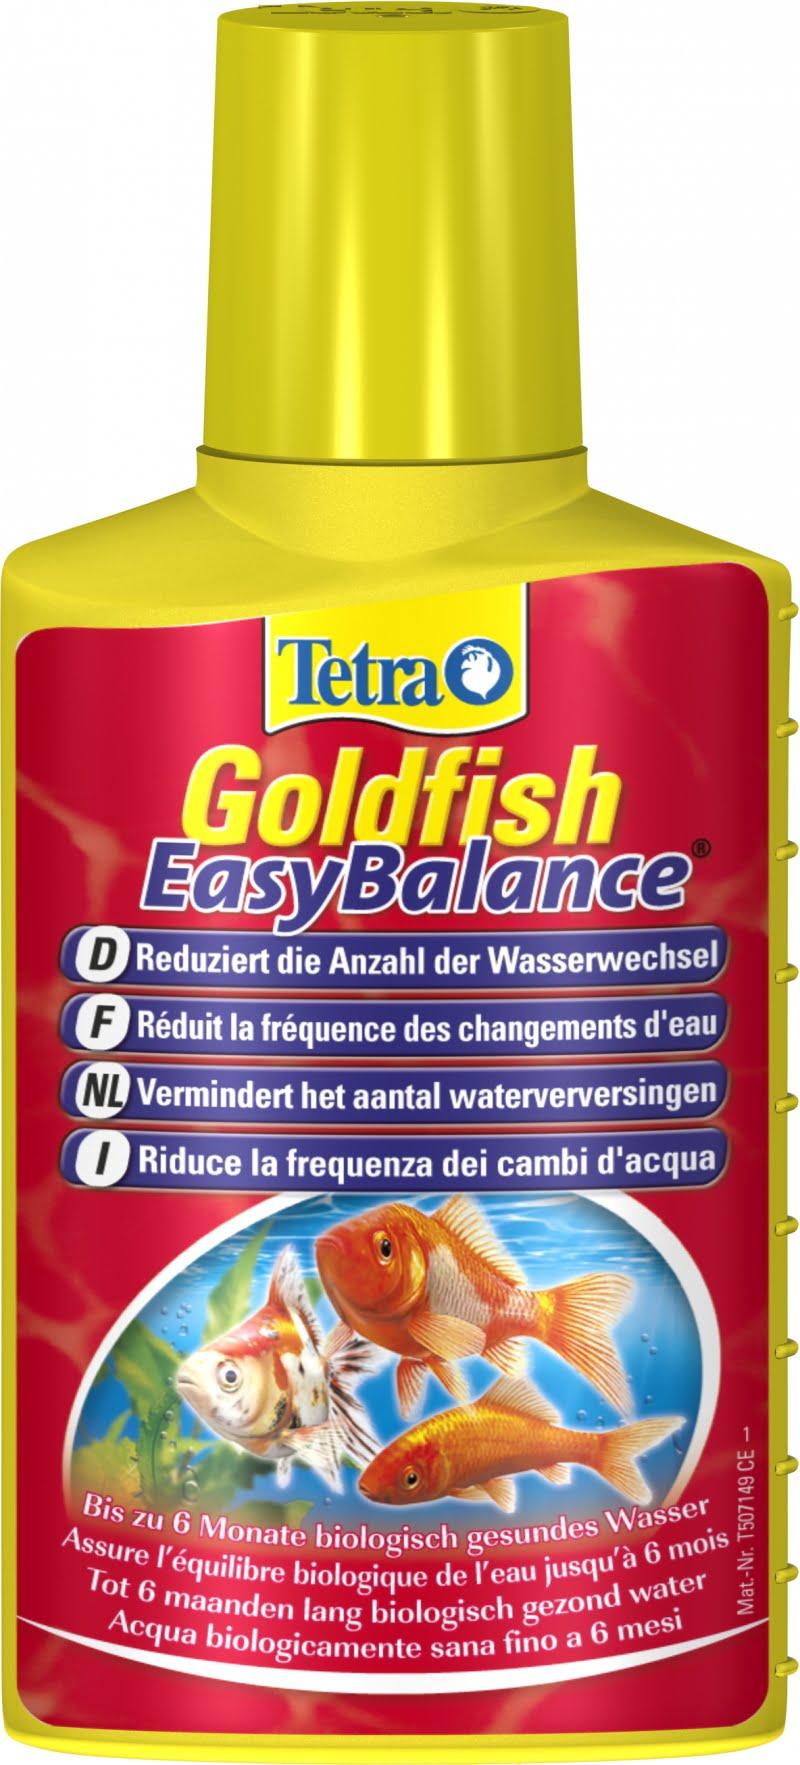 Tetra Goldfish Easy Balance 100ml